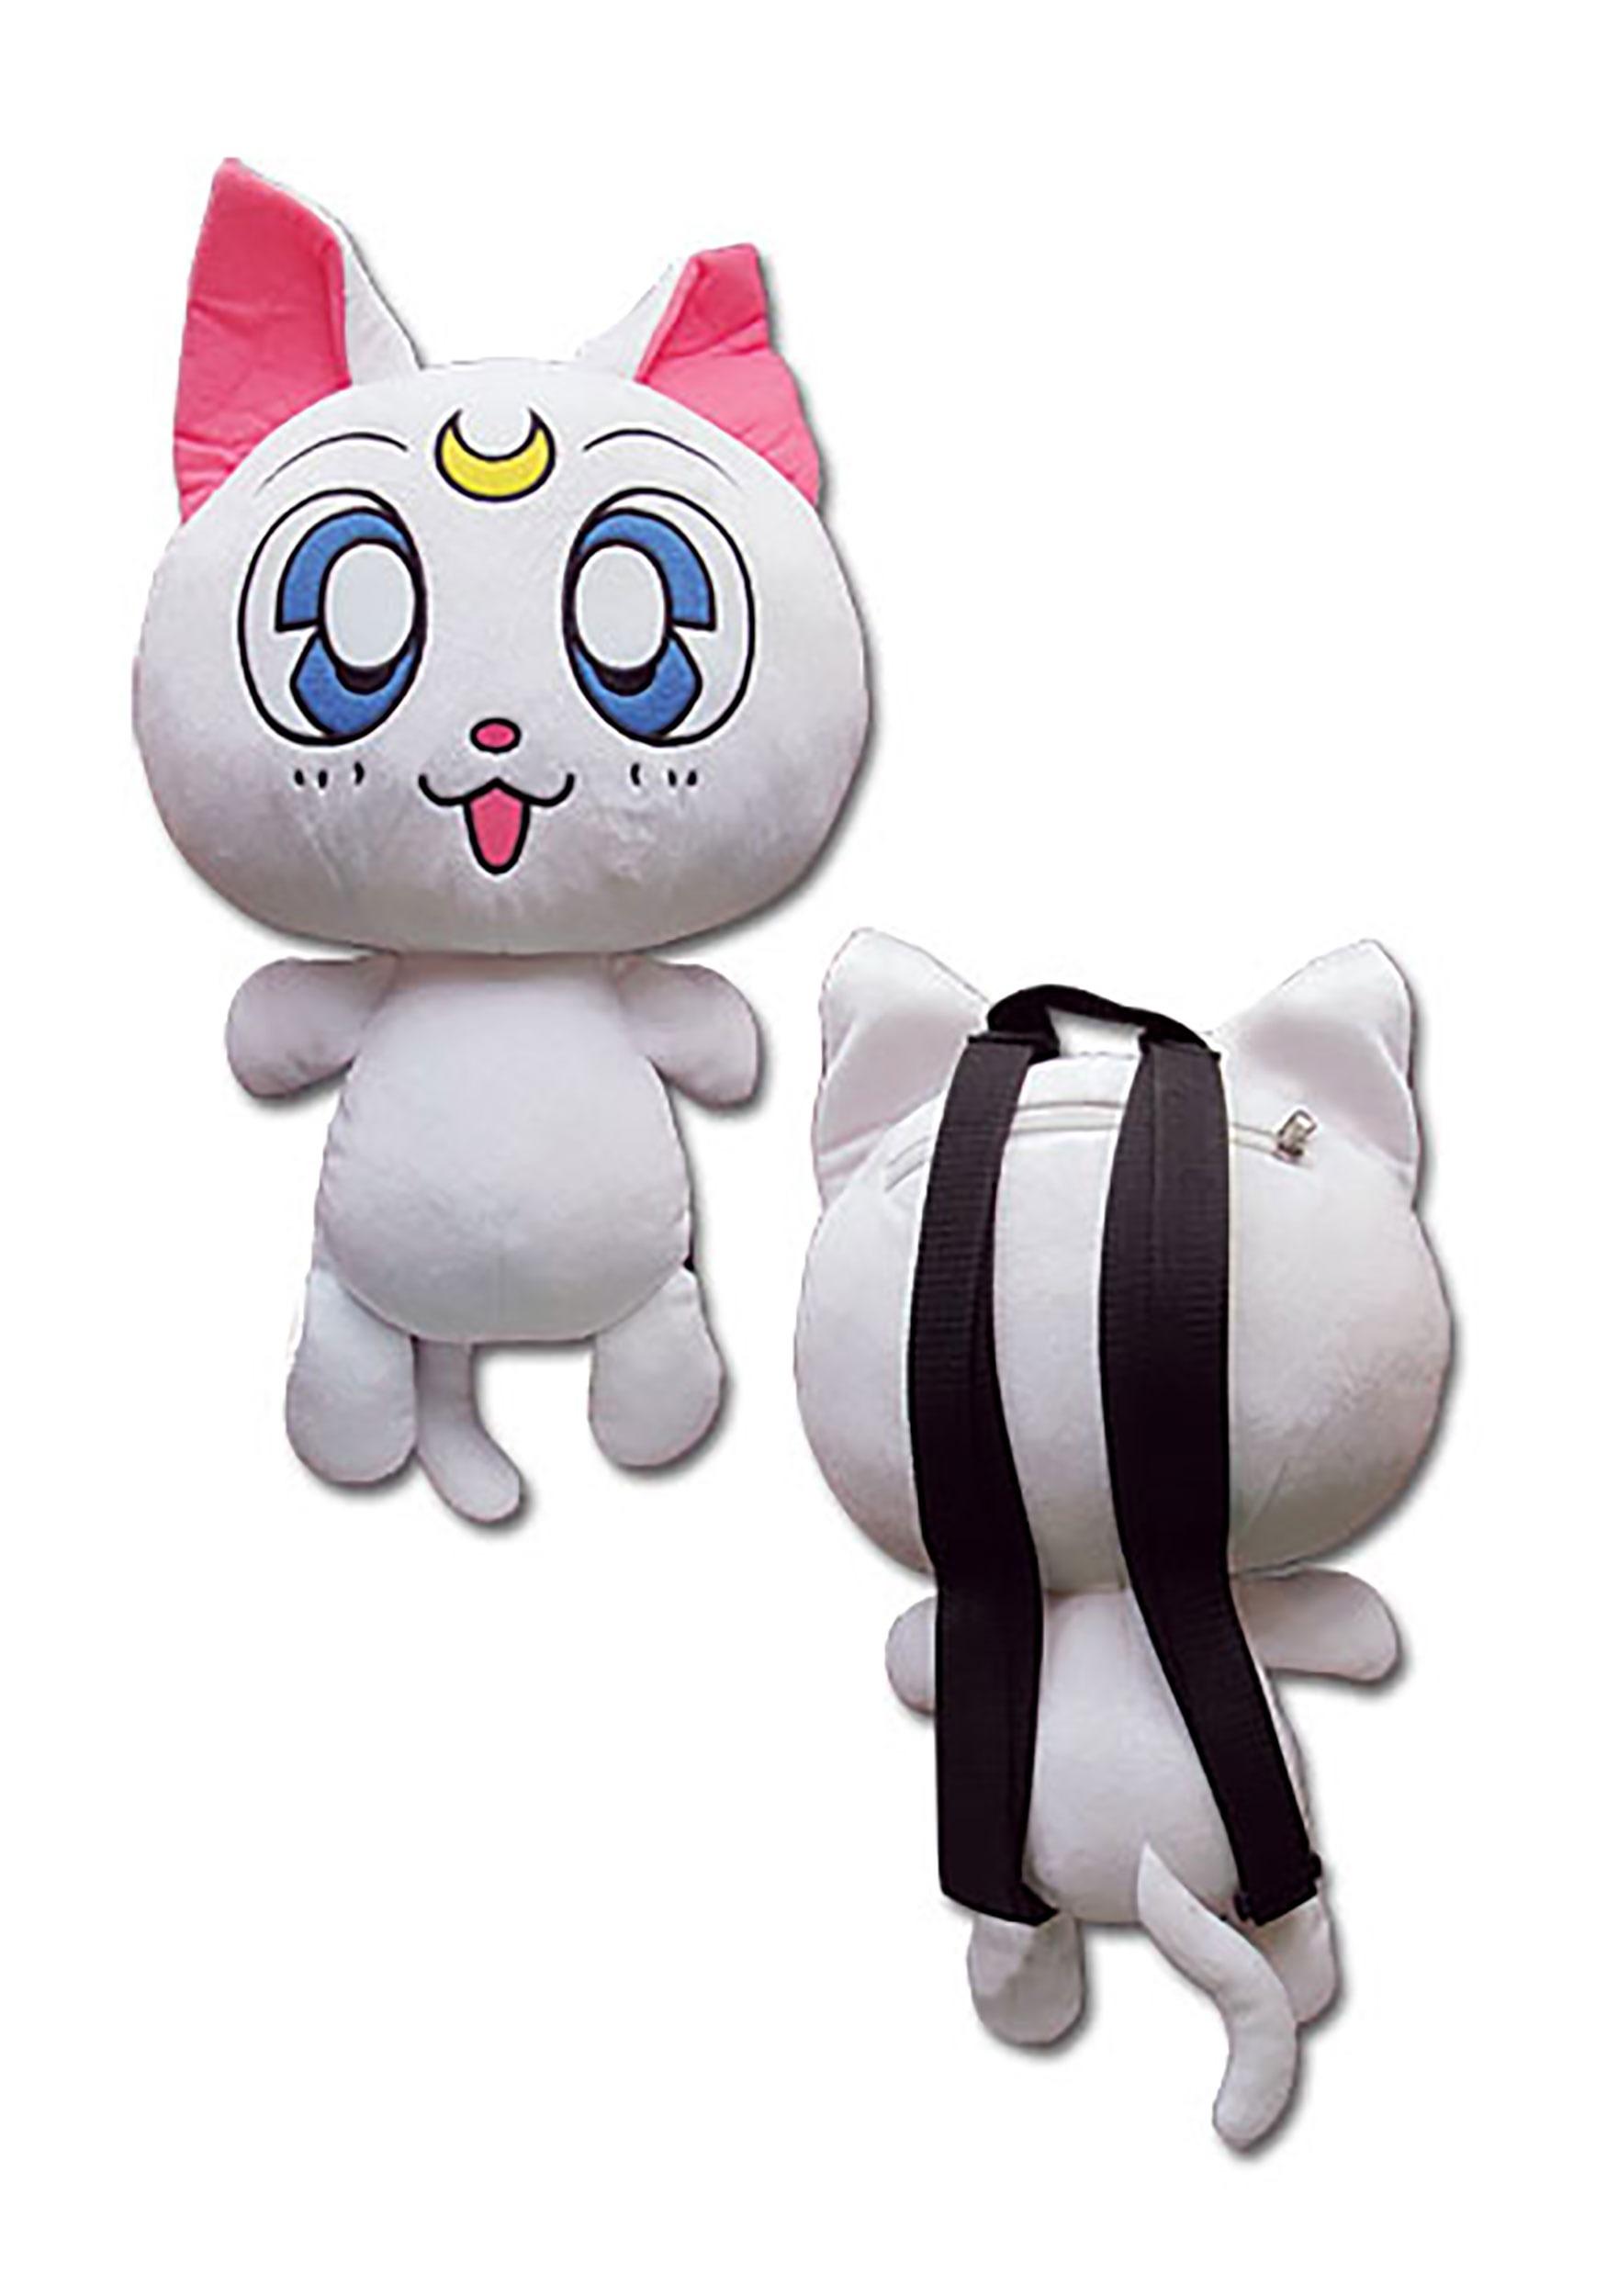 Sailor moon artemis 125 plush bag